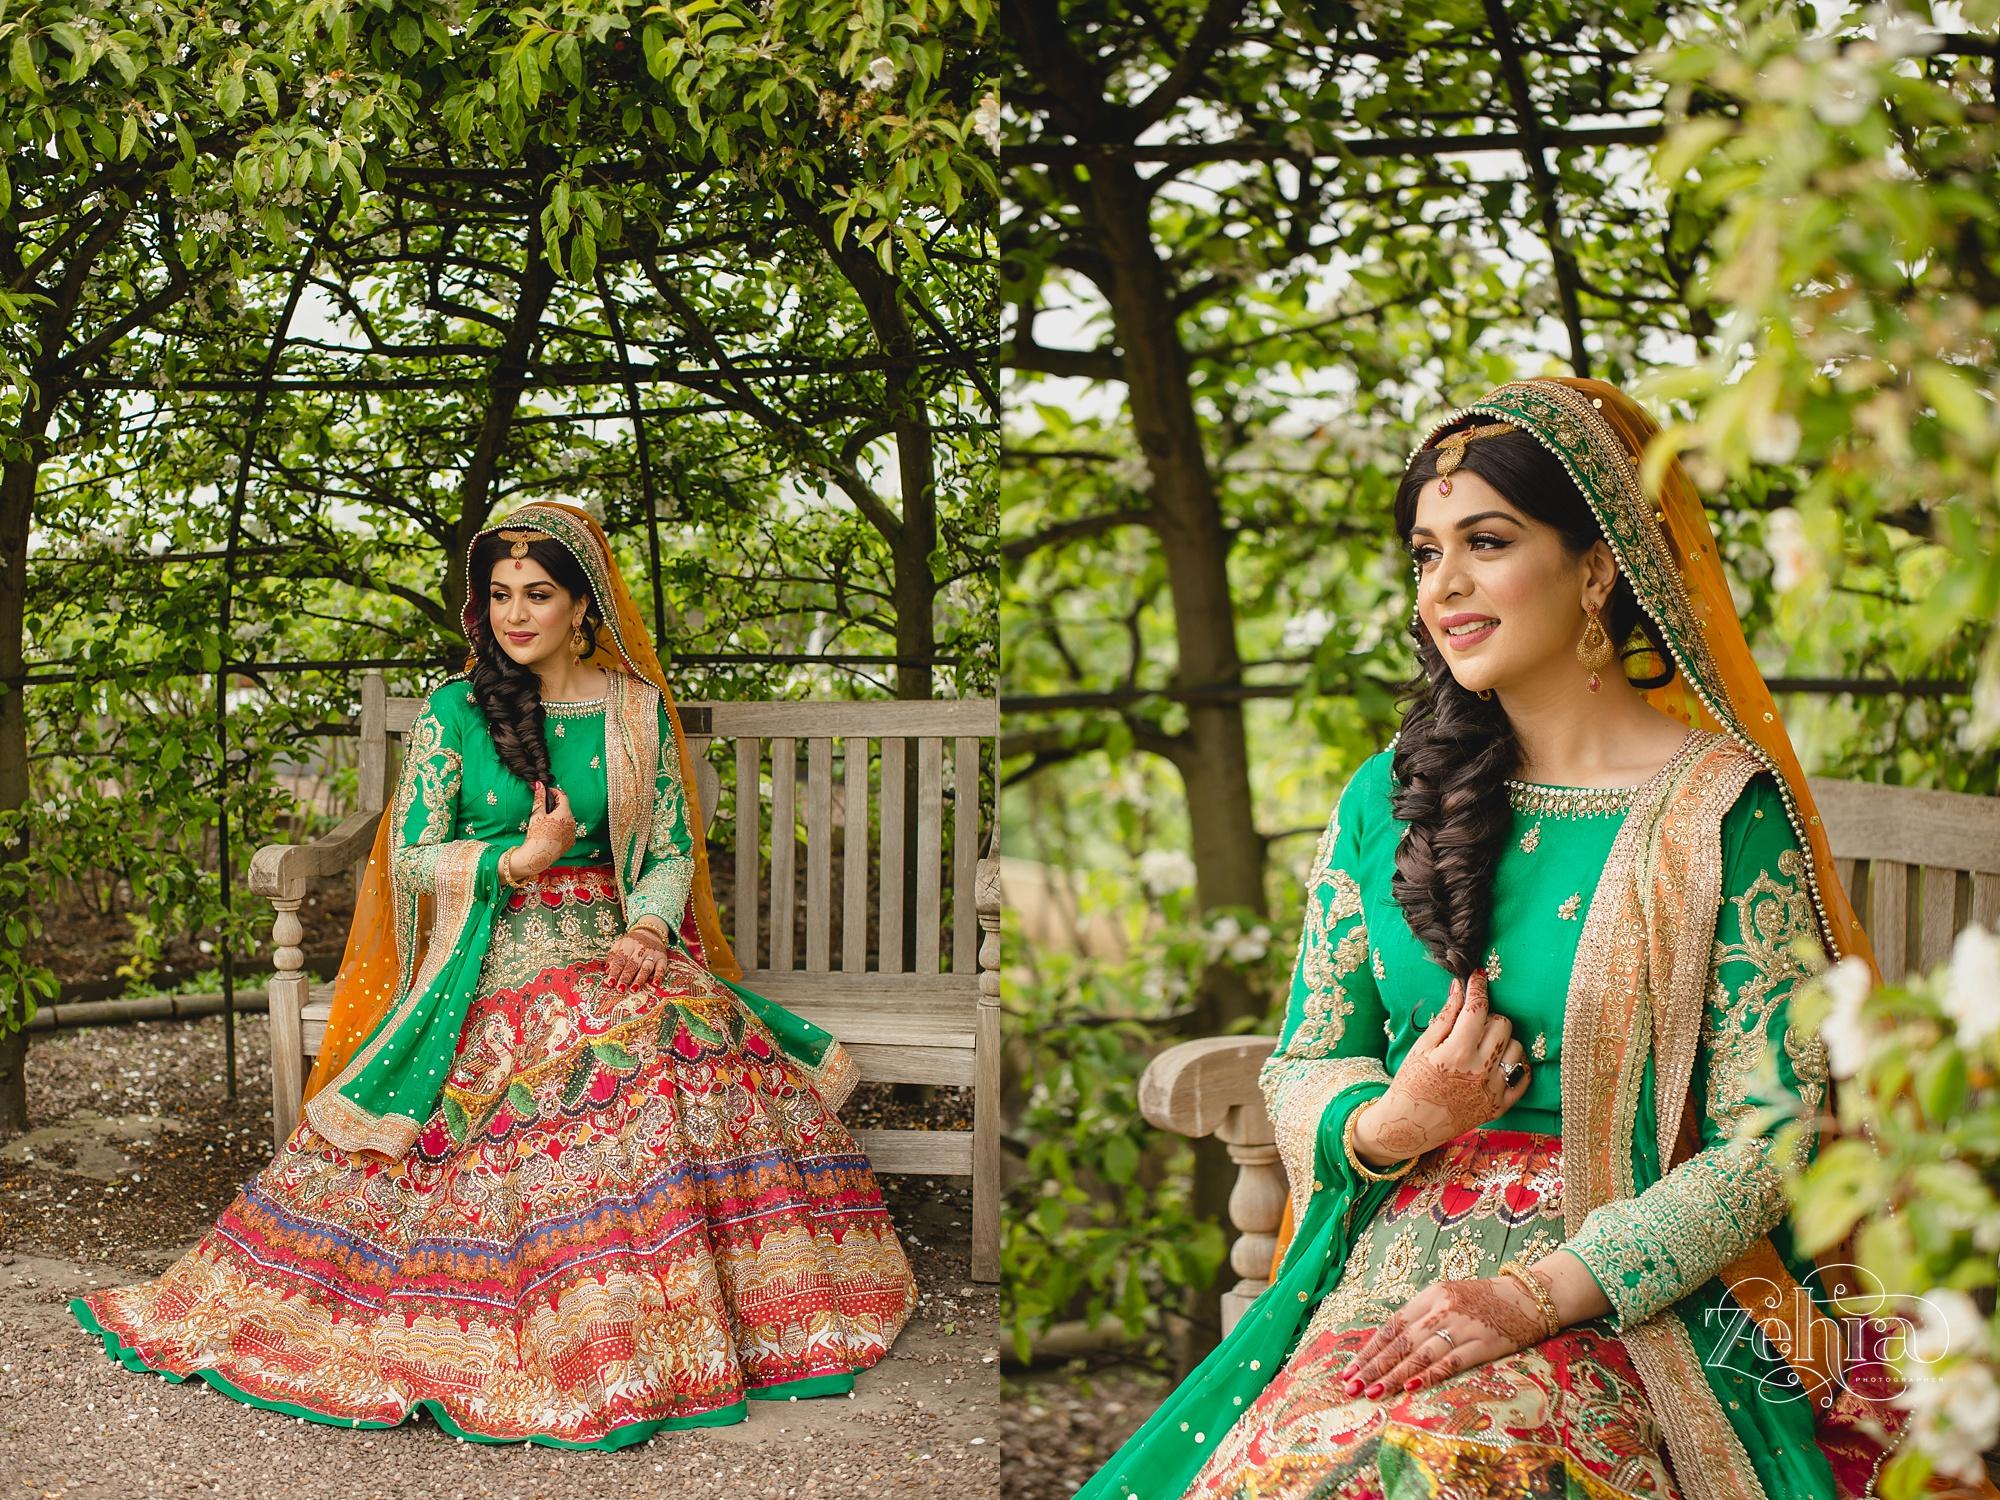 zehra wedding photographer arley hall cheshire006.jpg